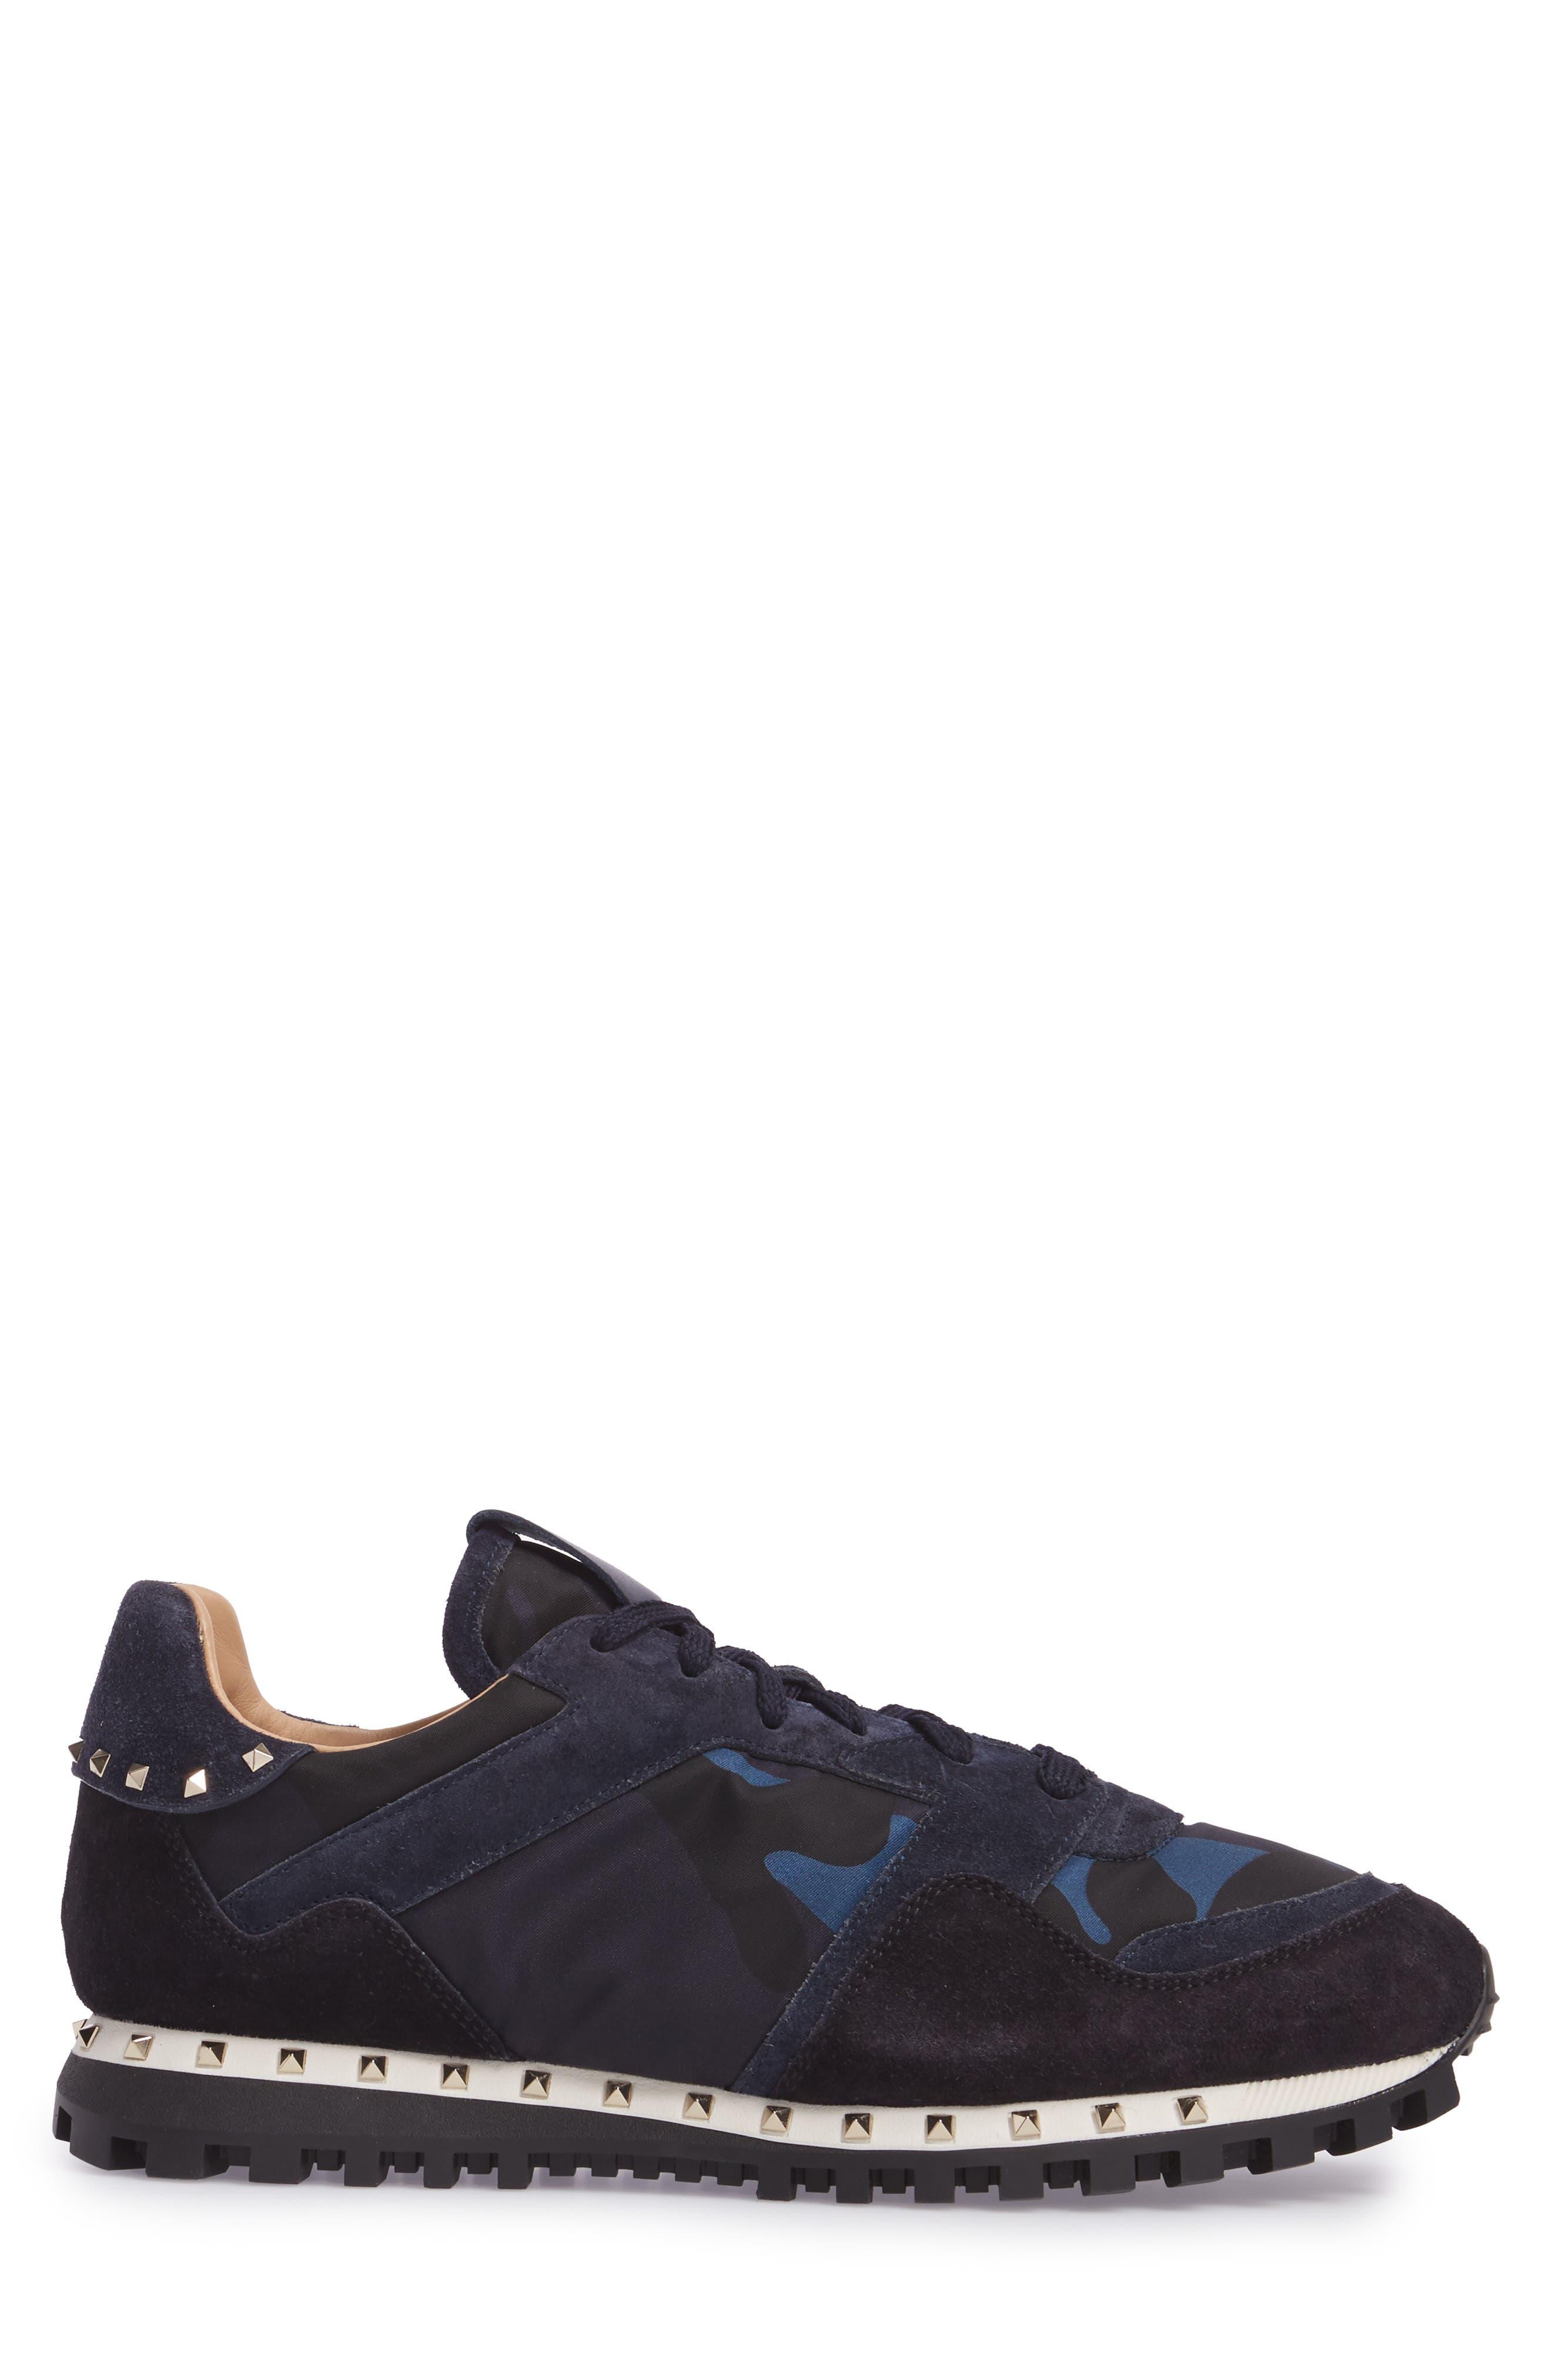 Camo Rockstud Sneaker,                             Alternate thumbnail 3, color,                             Marine/ Nero/ Dark Blue